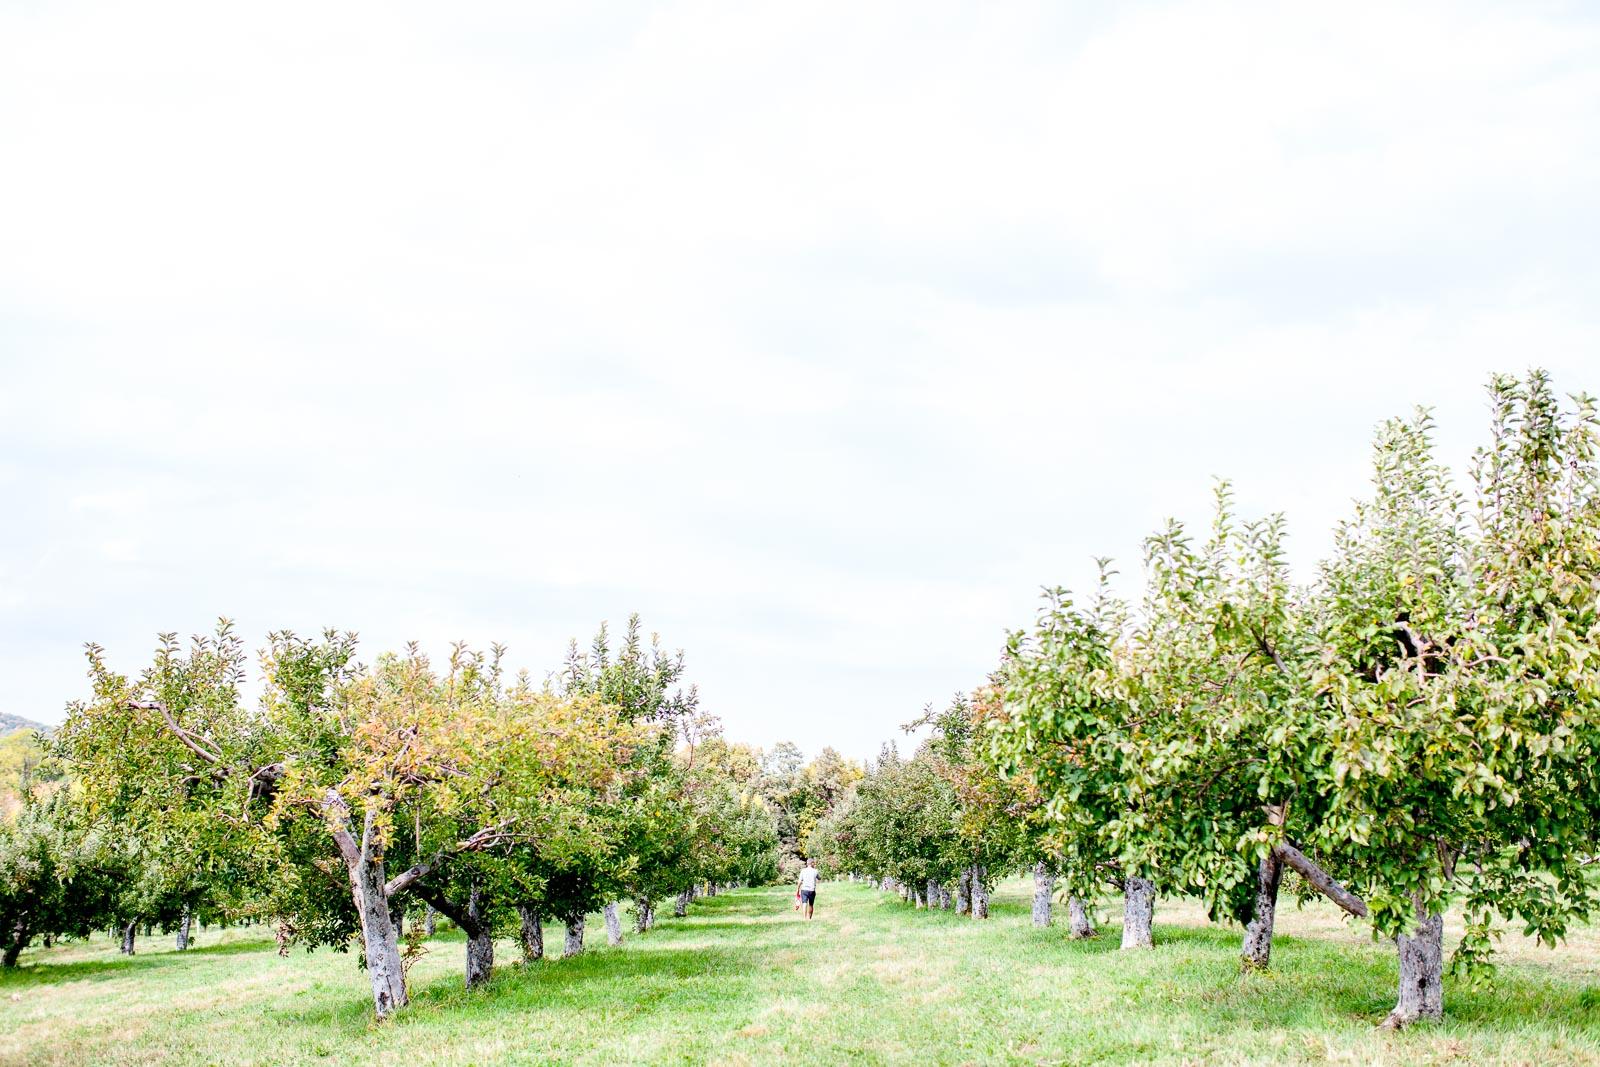 fishkill-farm-applepiking-2016-robertiaga-3